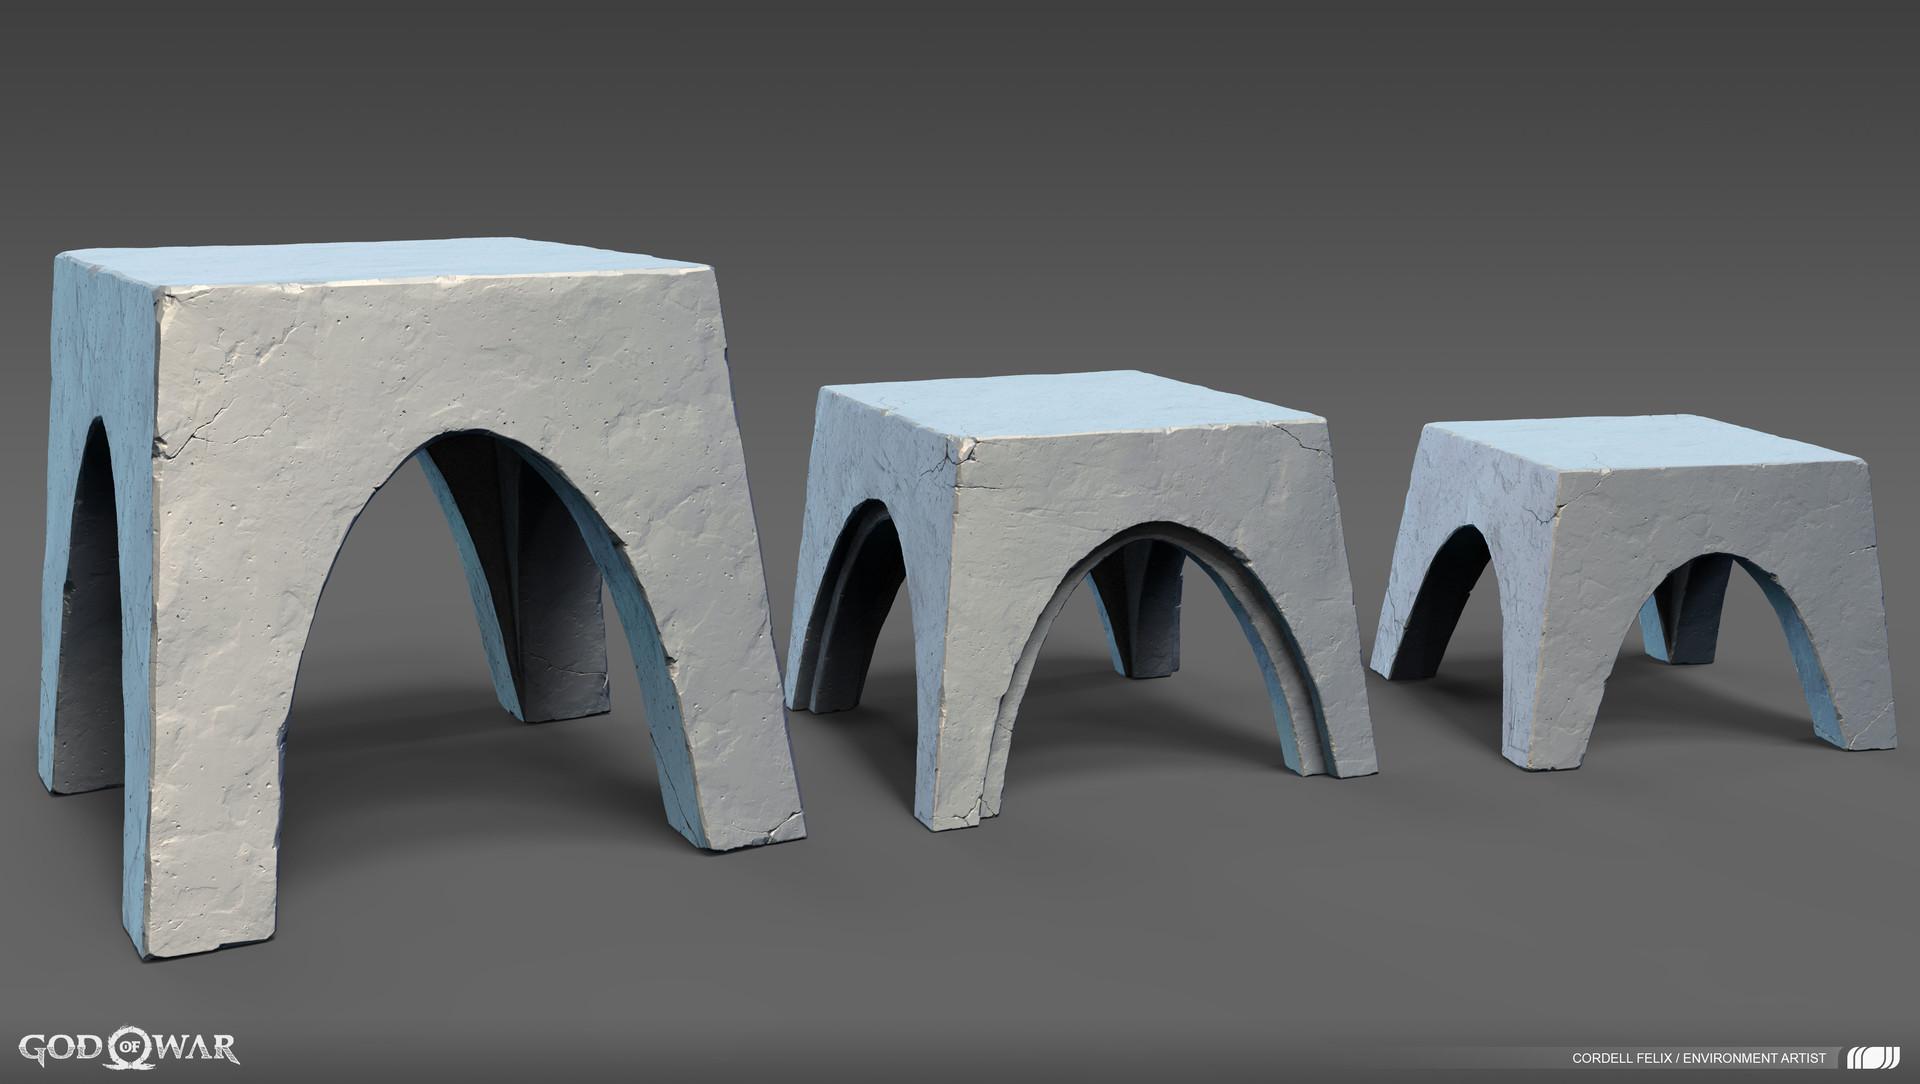 Cordell felix stone bases4dk2pillars 01